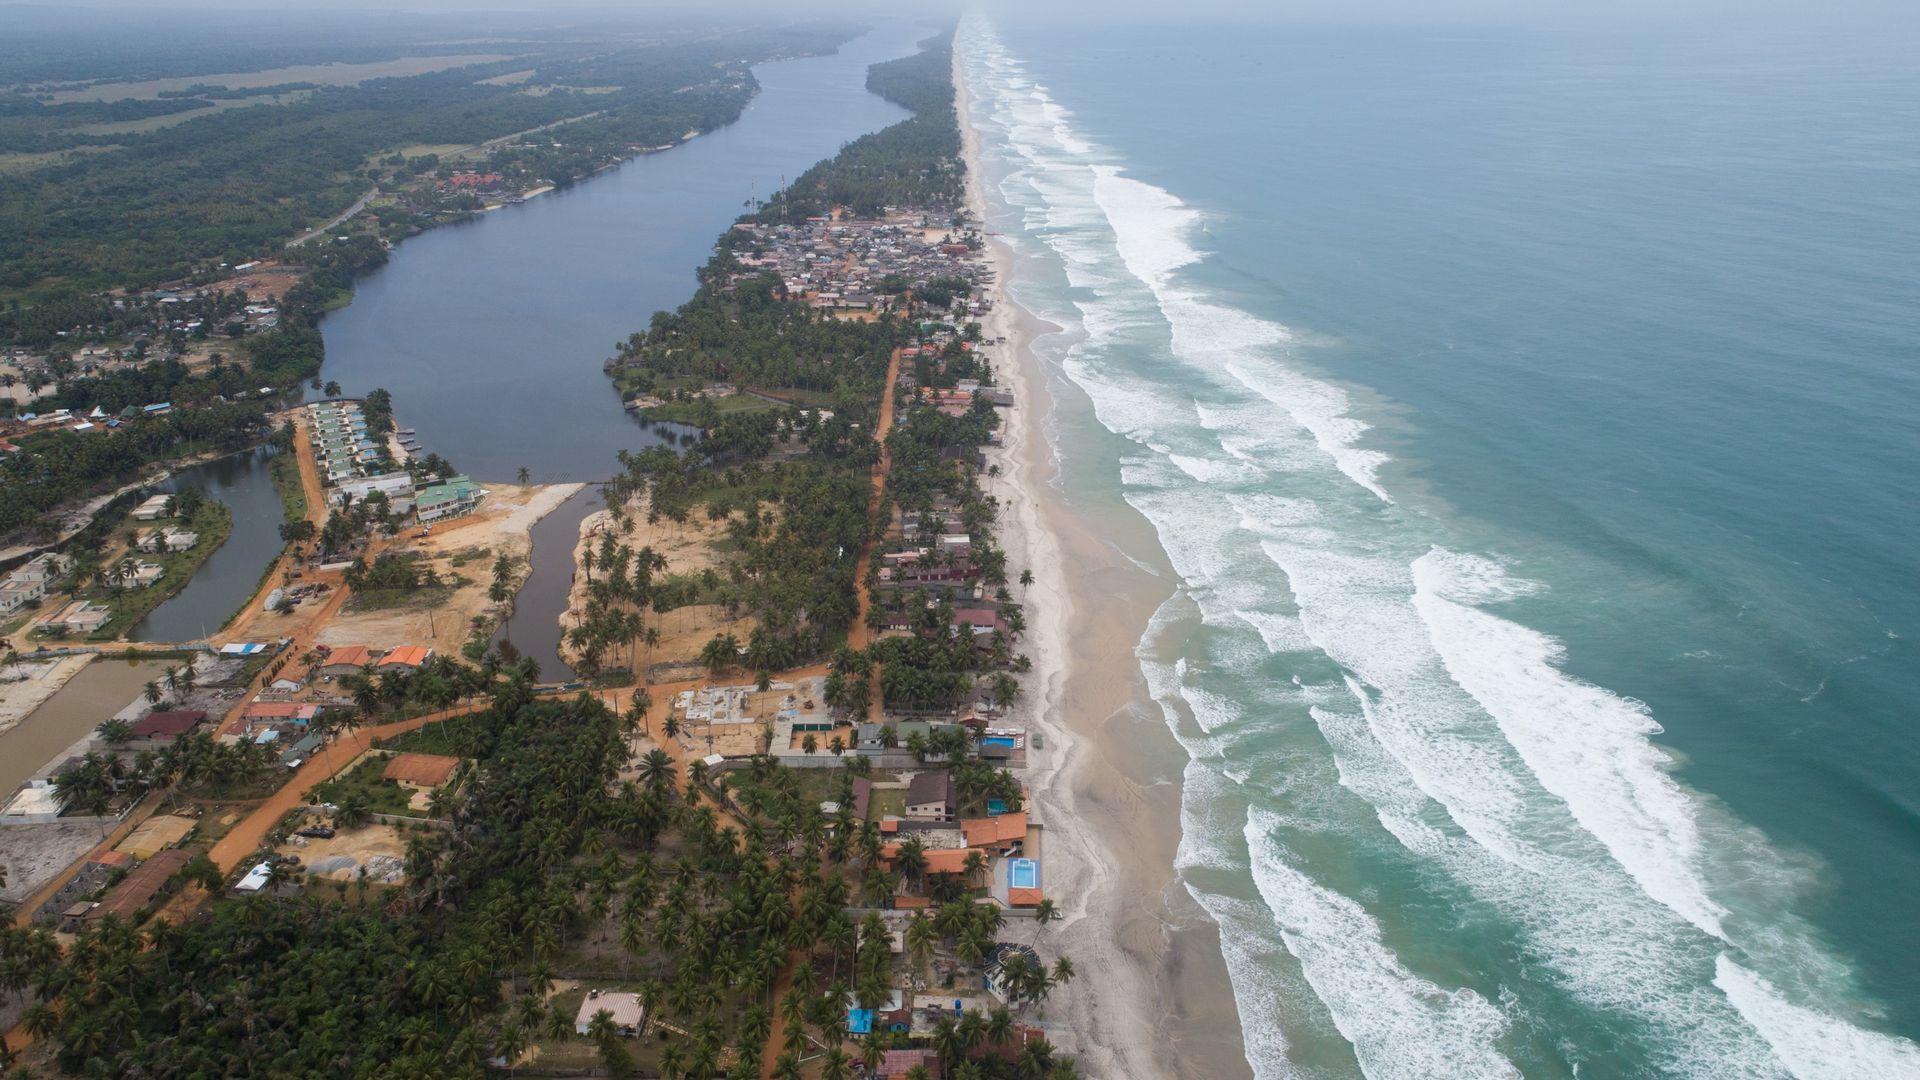 A drone photo shows the coastline in Abidjan, Ivory Coast on August 15, 2019. Ivory Coast,